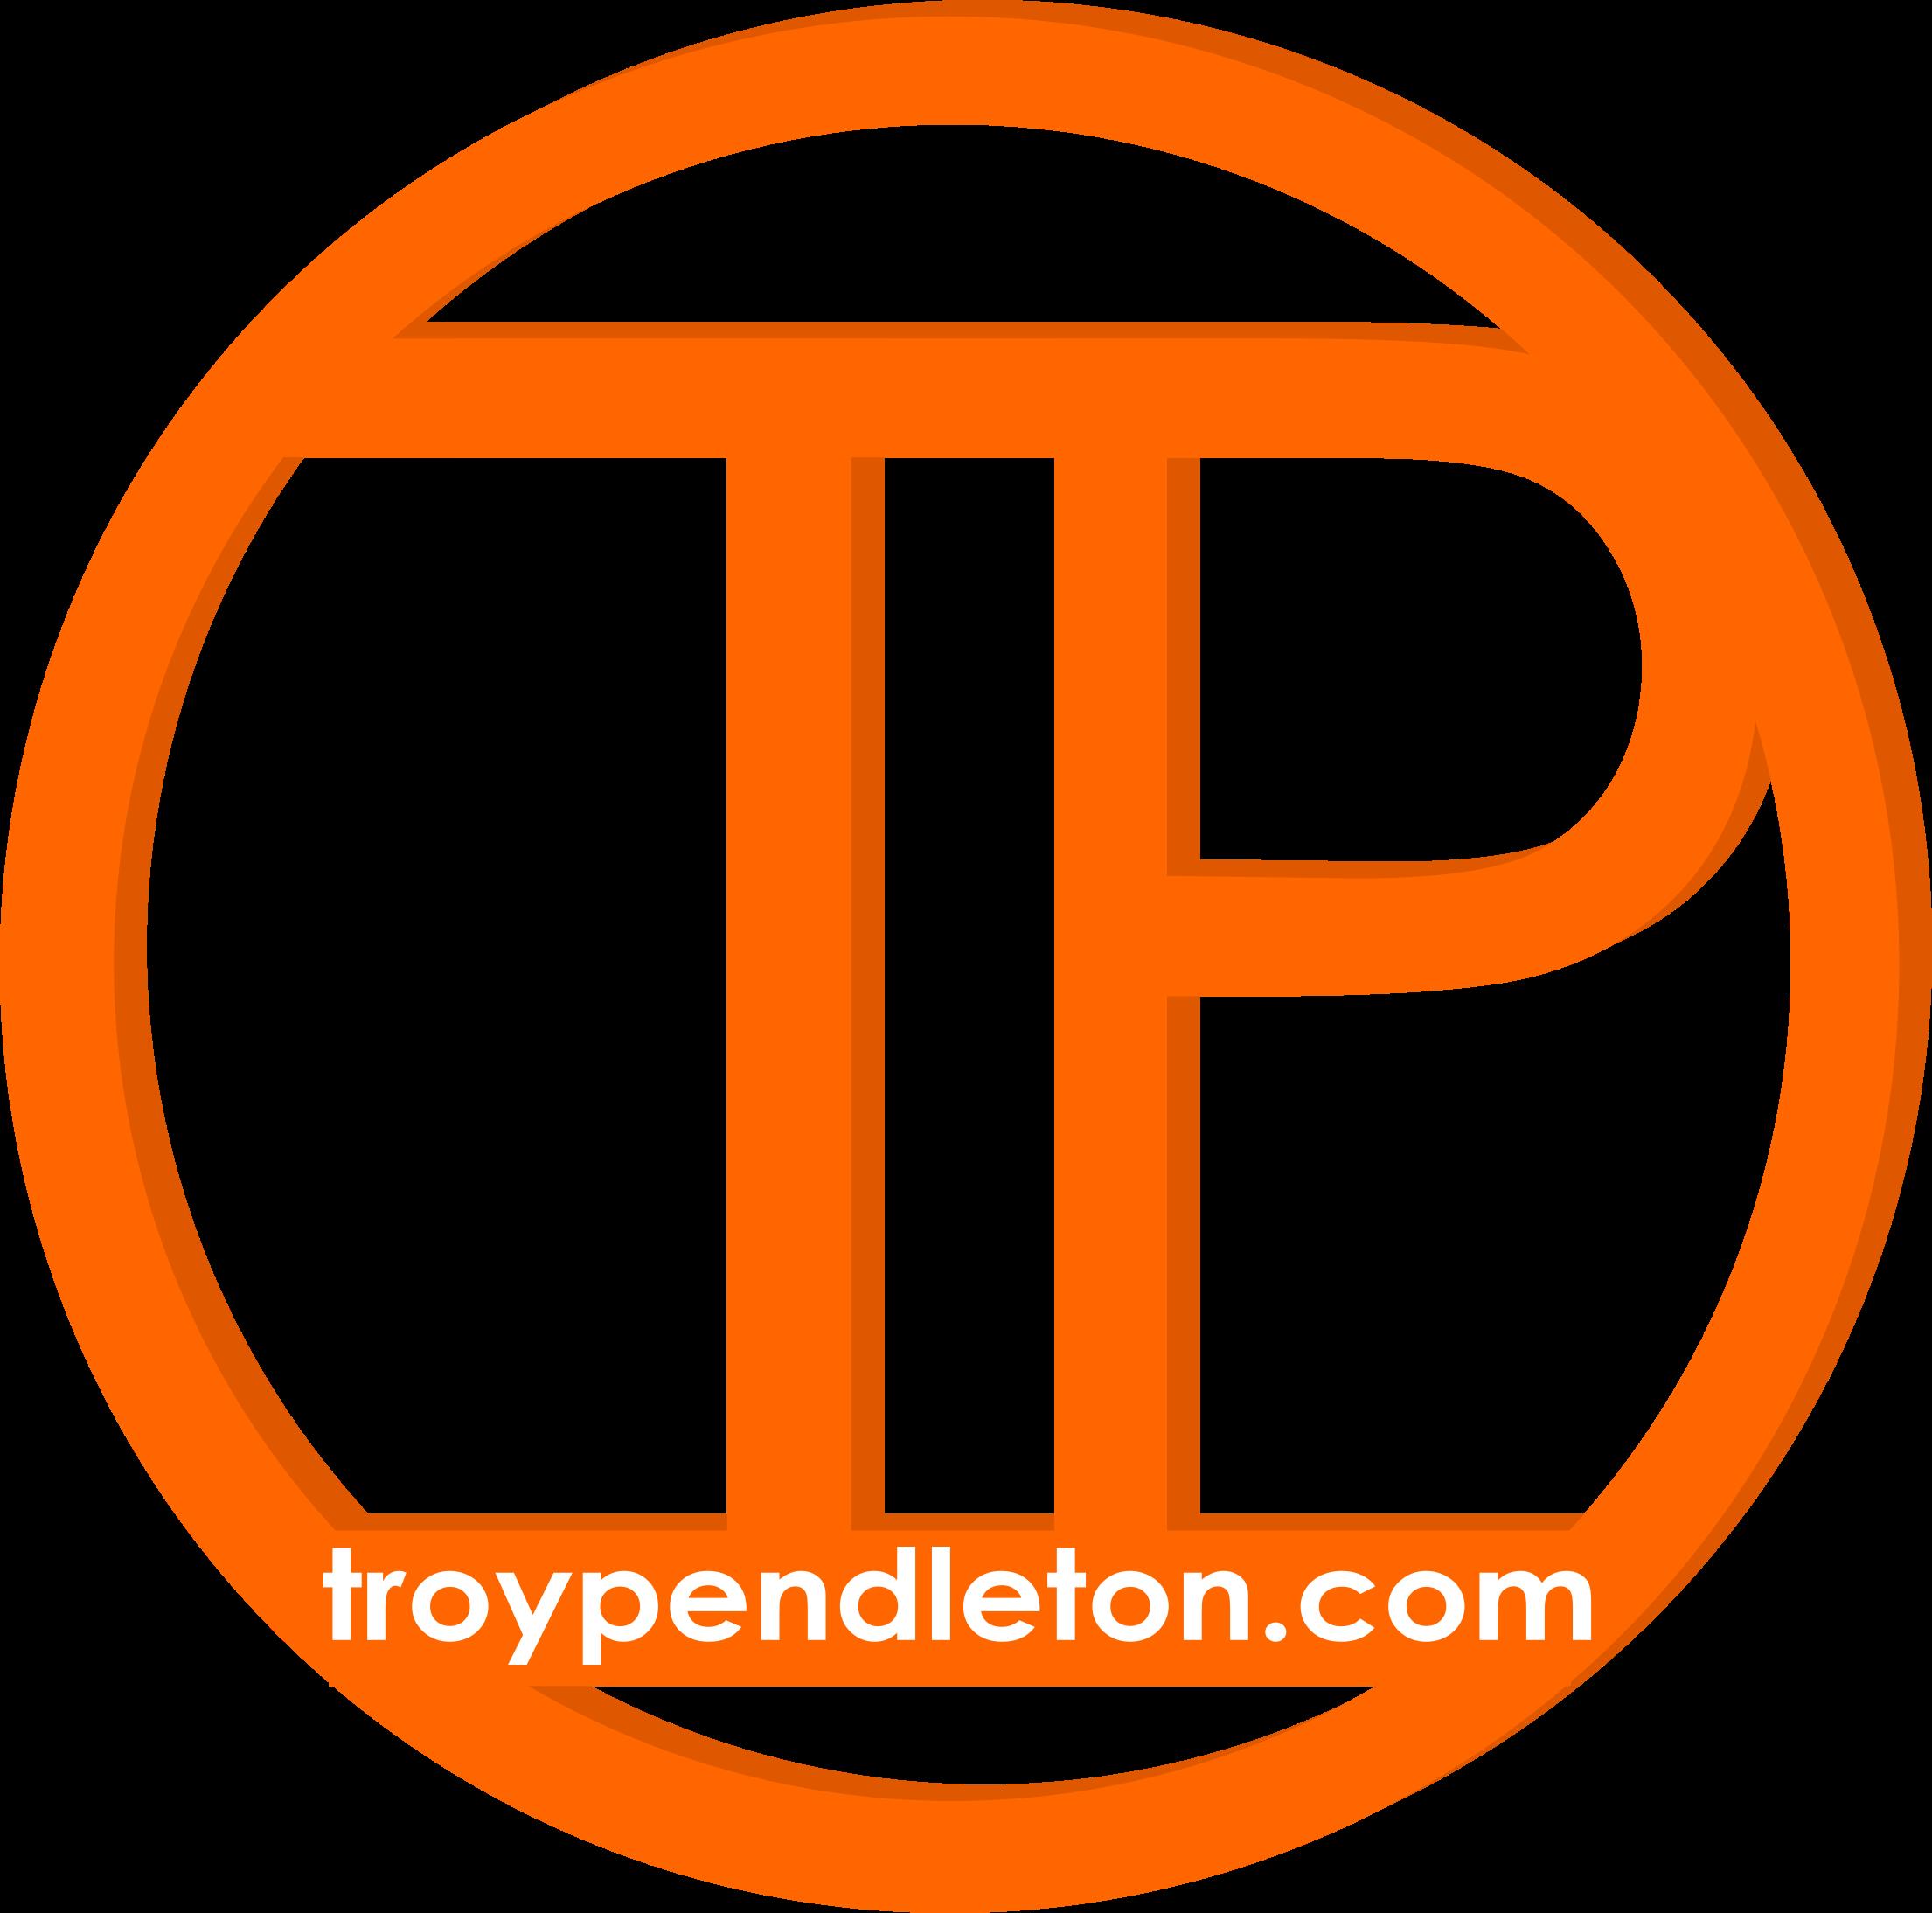 Troy Pendleton (Dot Com) Logo